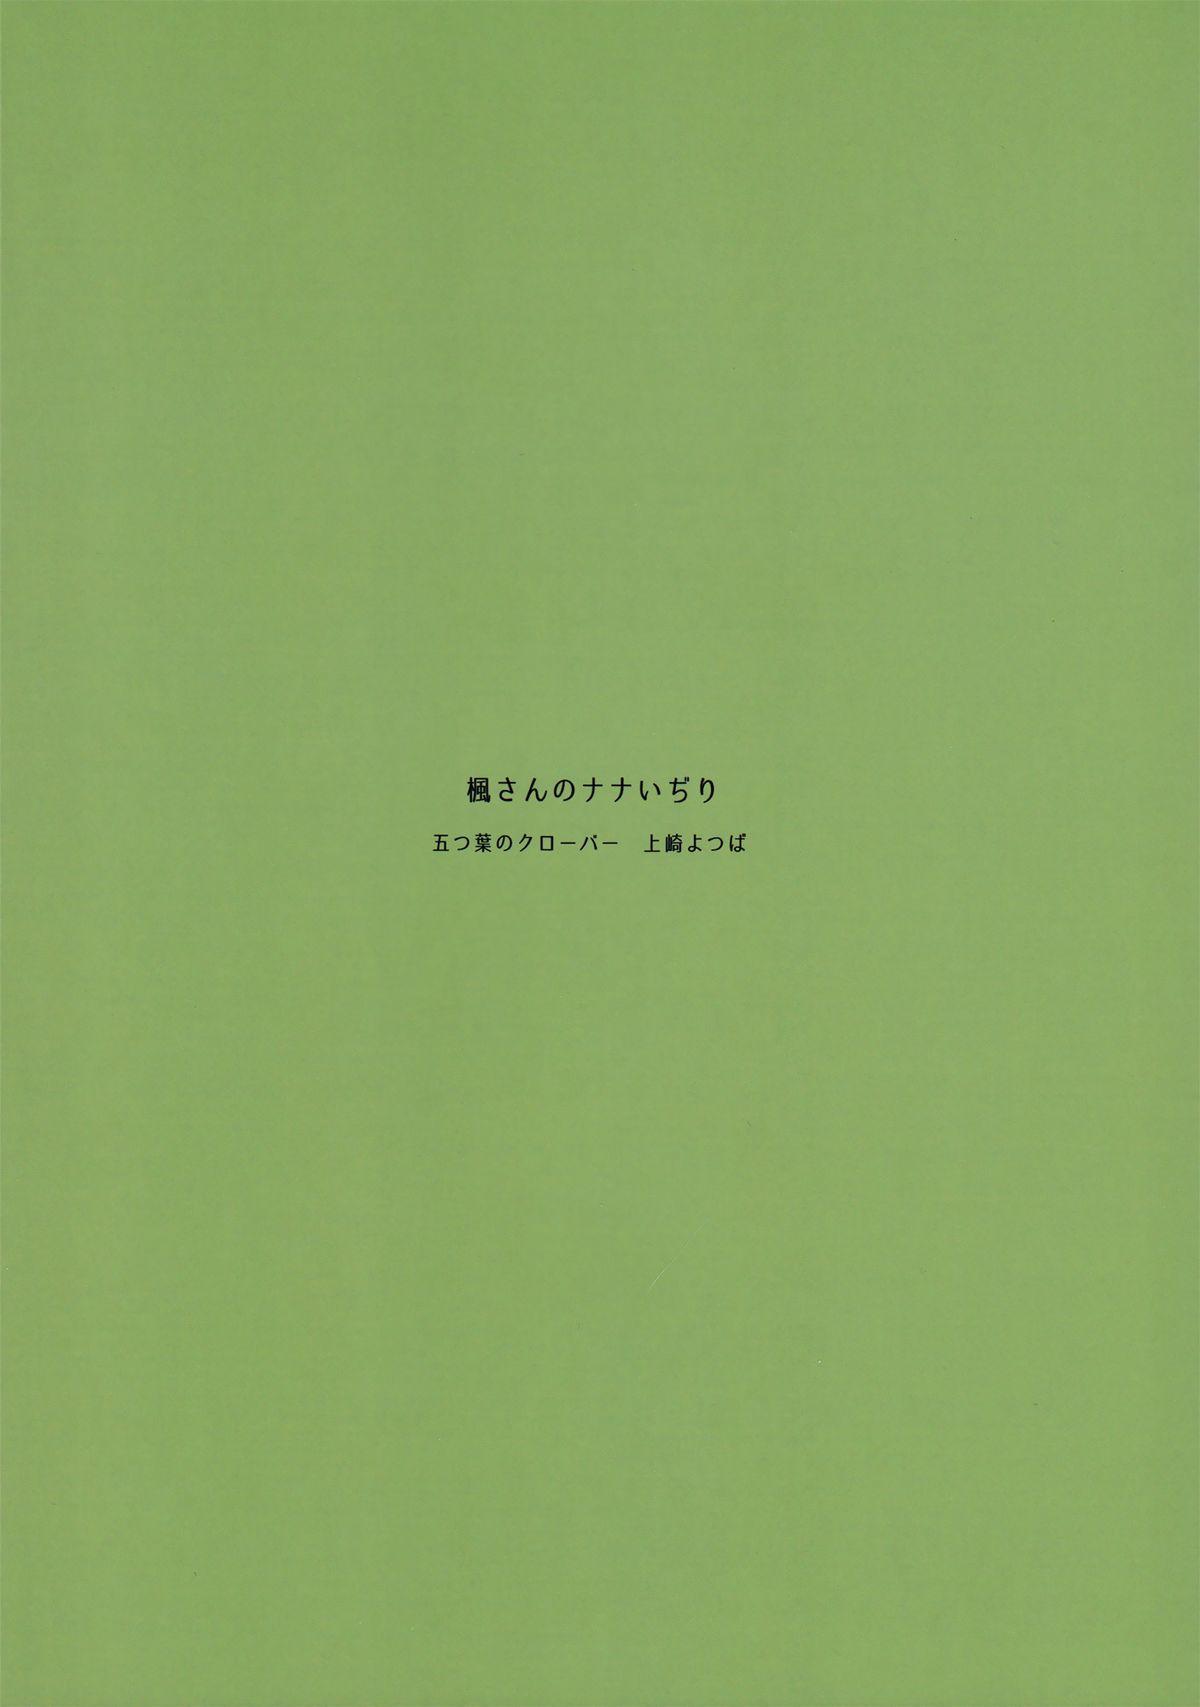 (SC2015 Winter) [Itsusuba no Clover (Kamizaki Yotsuba)] Kaede-san no Nana Ijiri   Kaede-san's Teasing of Nana (THE IDOLM@STER CINDERELLA GIRLS) [English] [Yuri-ism] 17